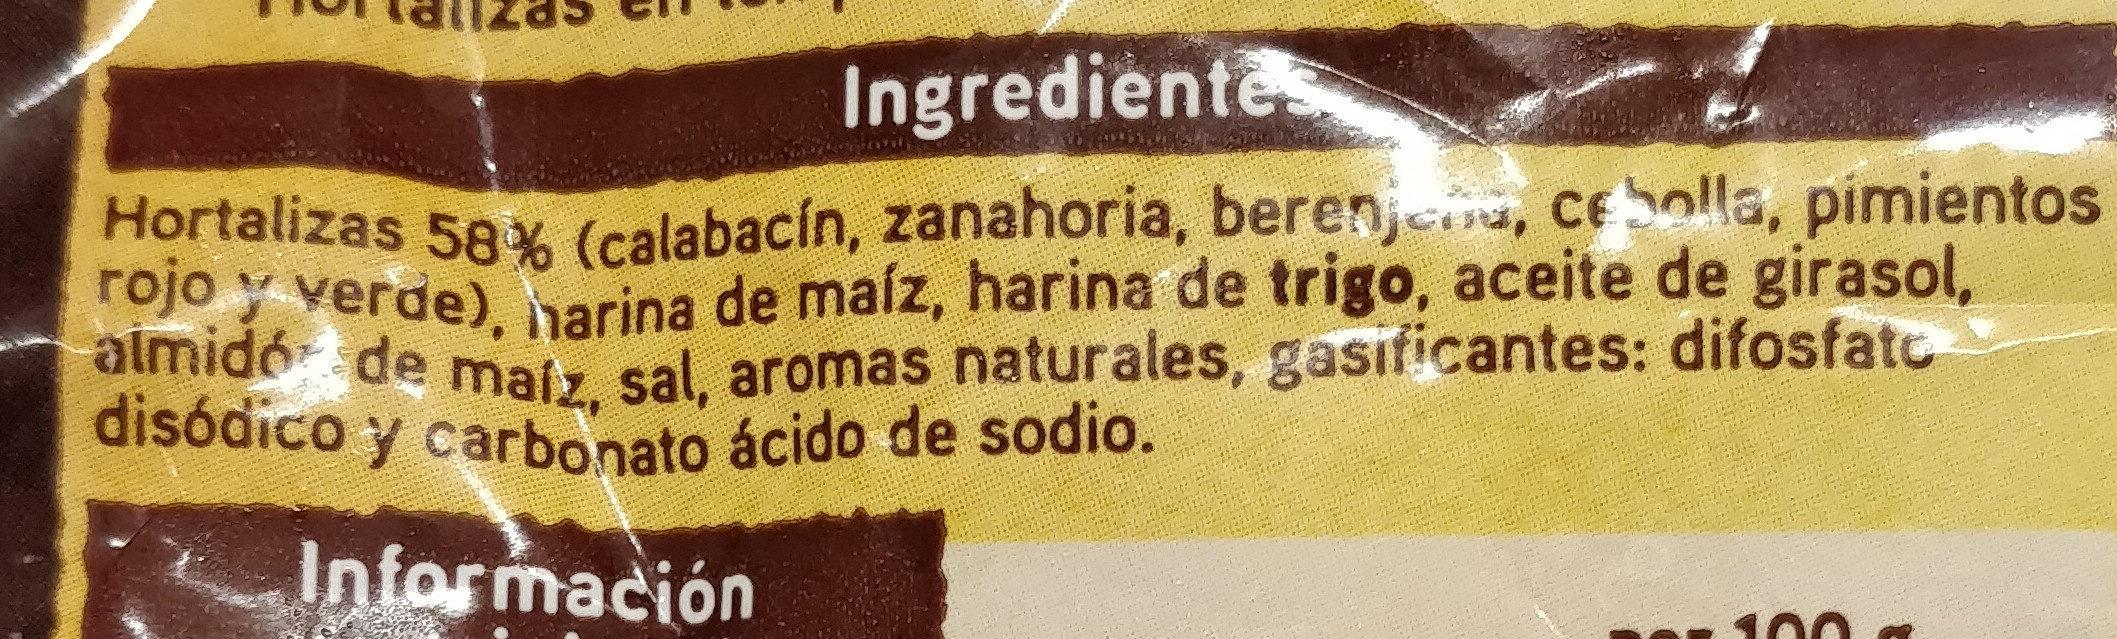 Tempura - Ingrédients - es